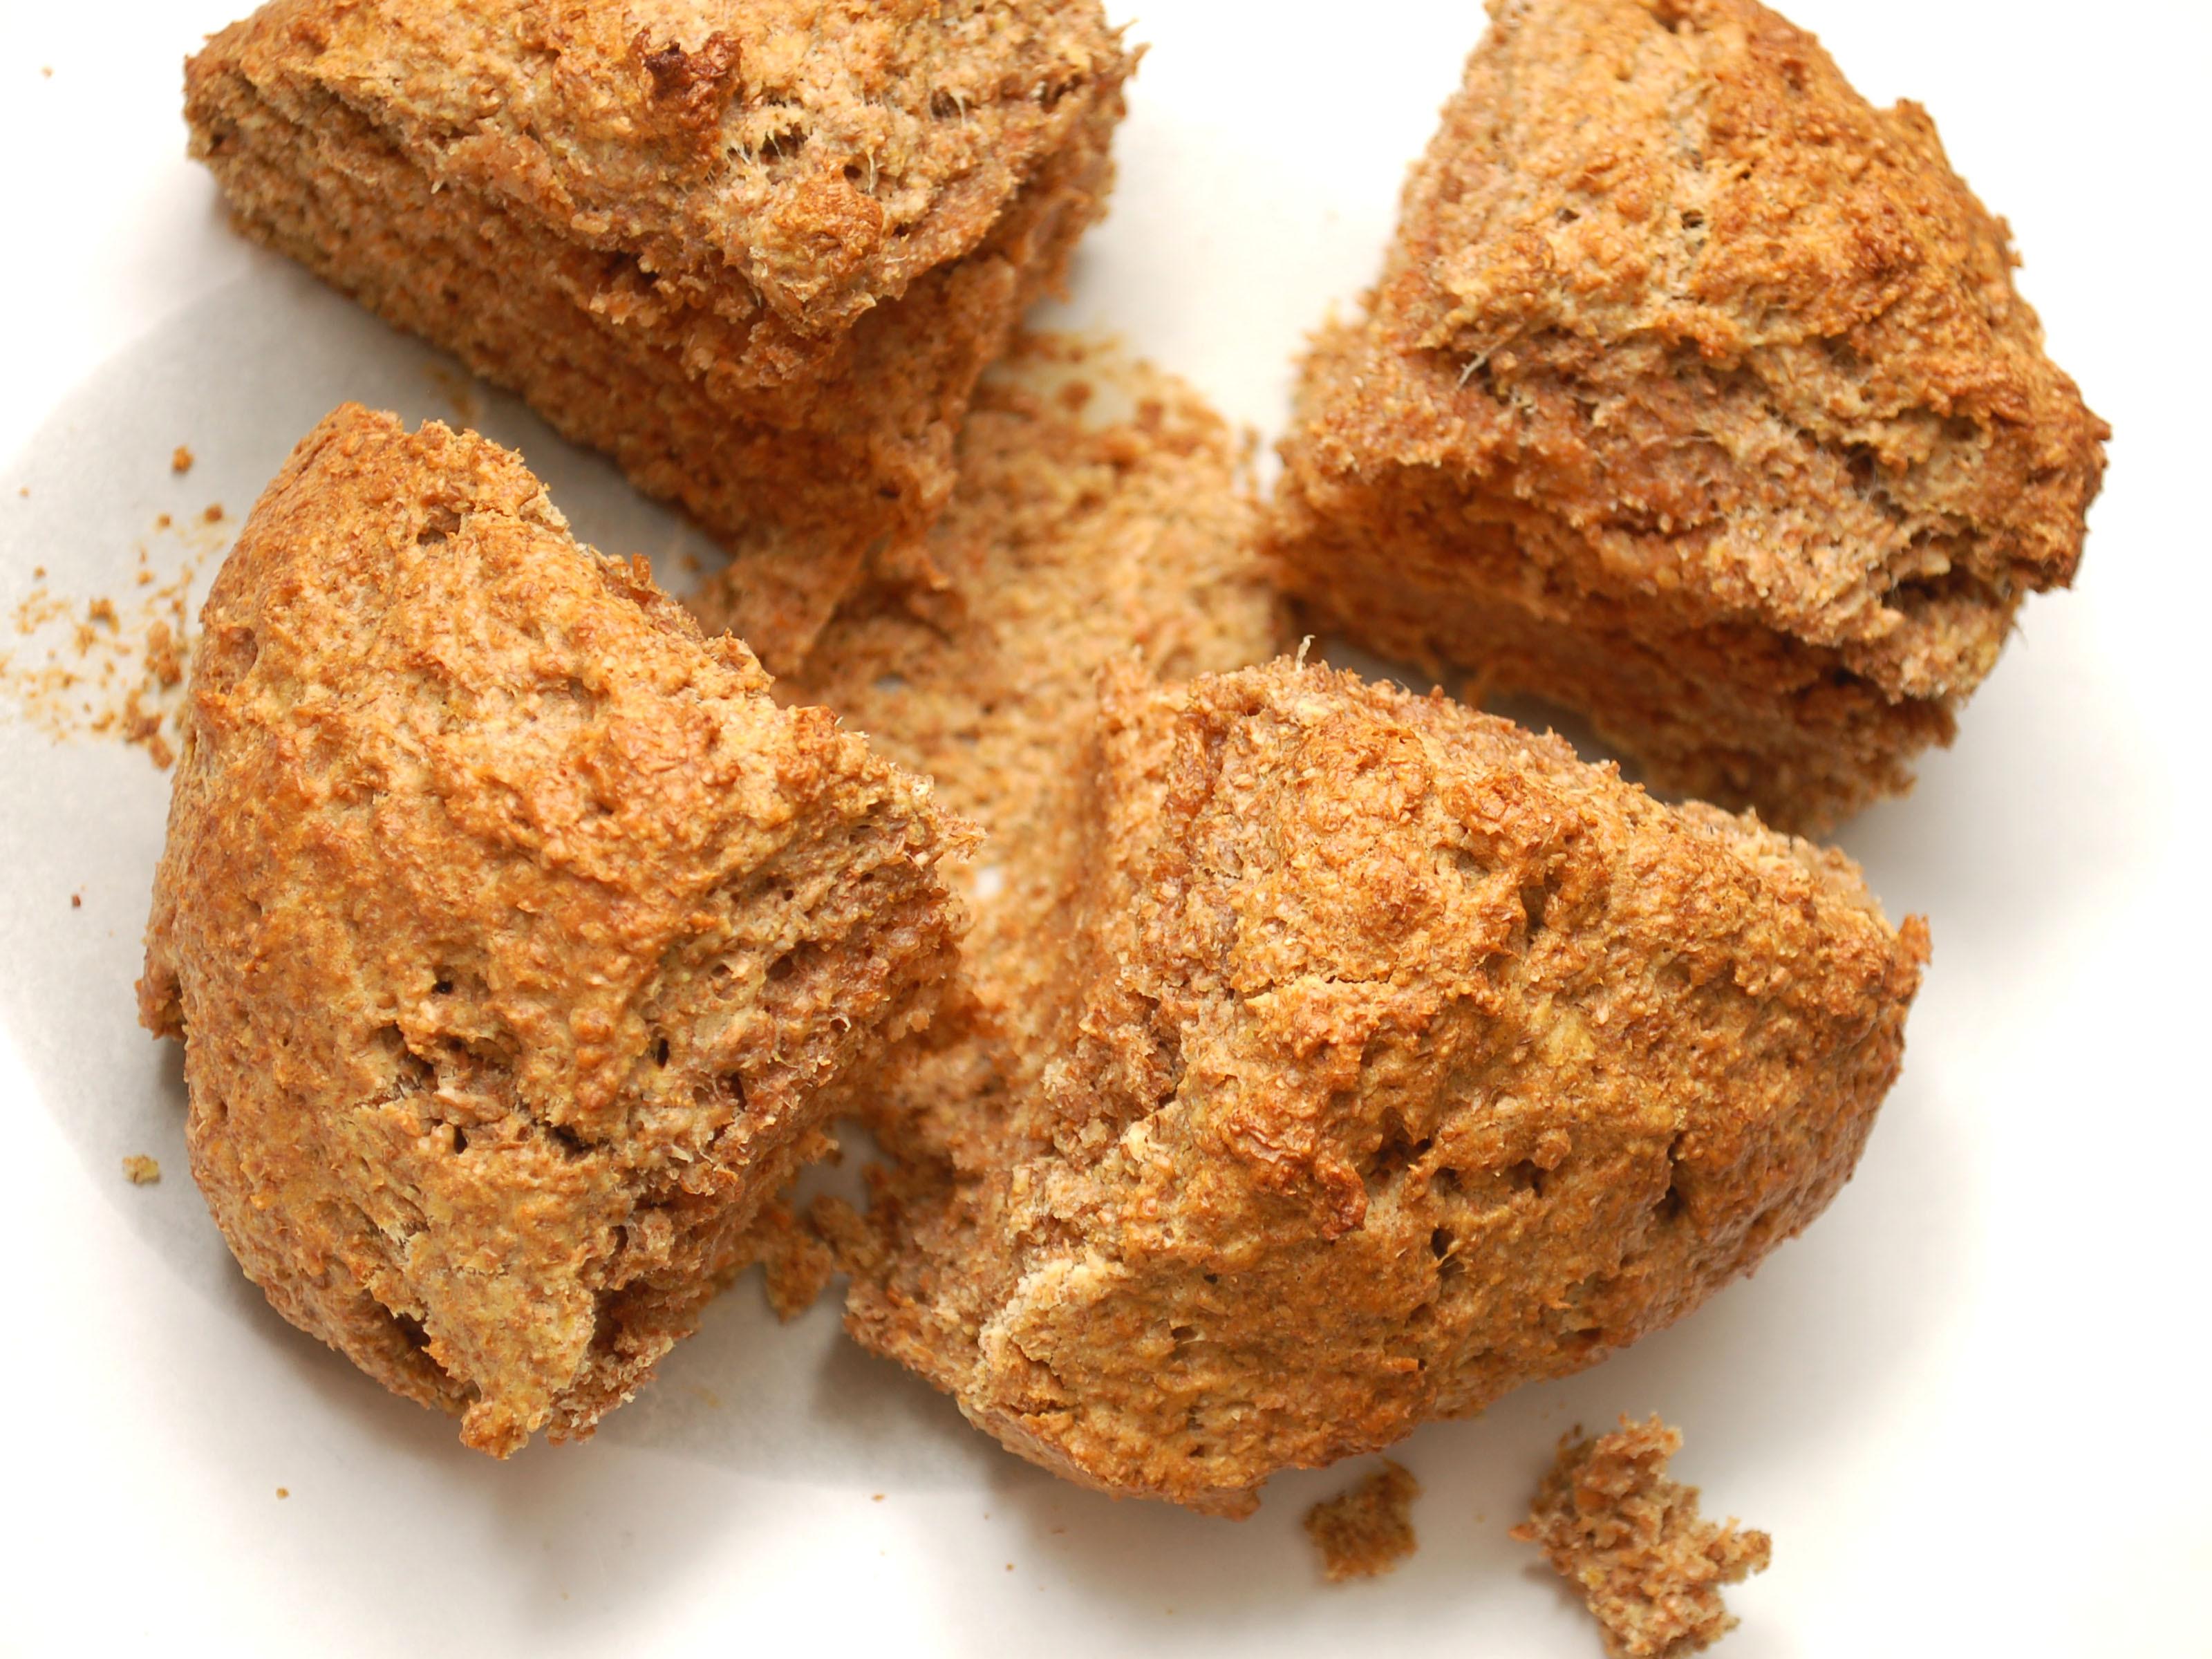 How To Make Irish Soda Bread  How to Make Irish Soda Bread 10 Steps with